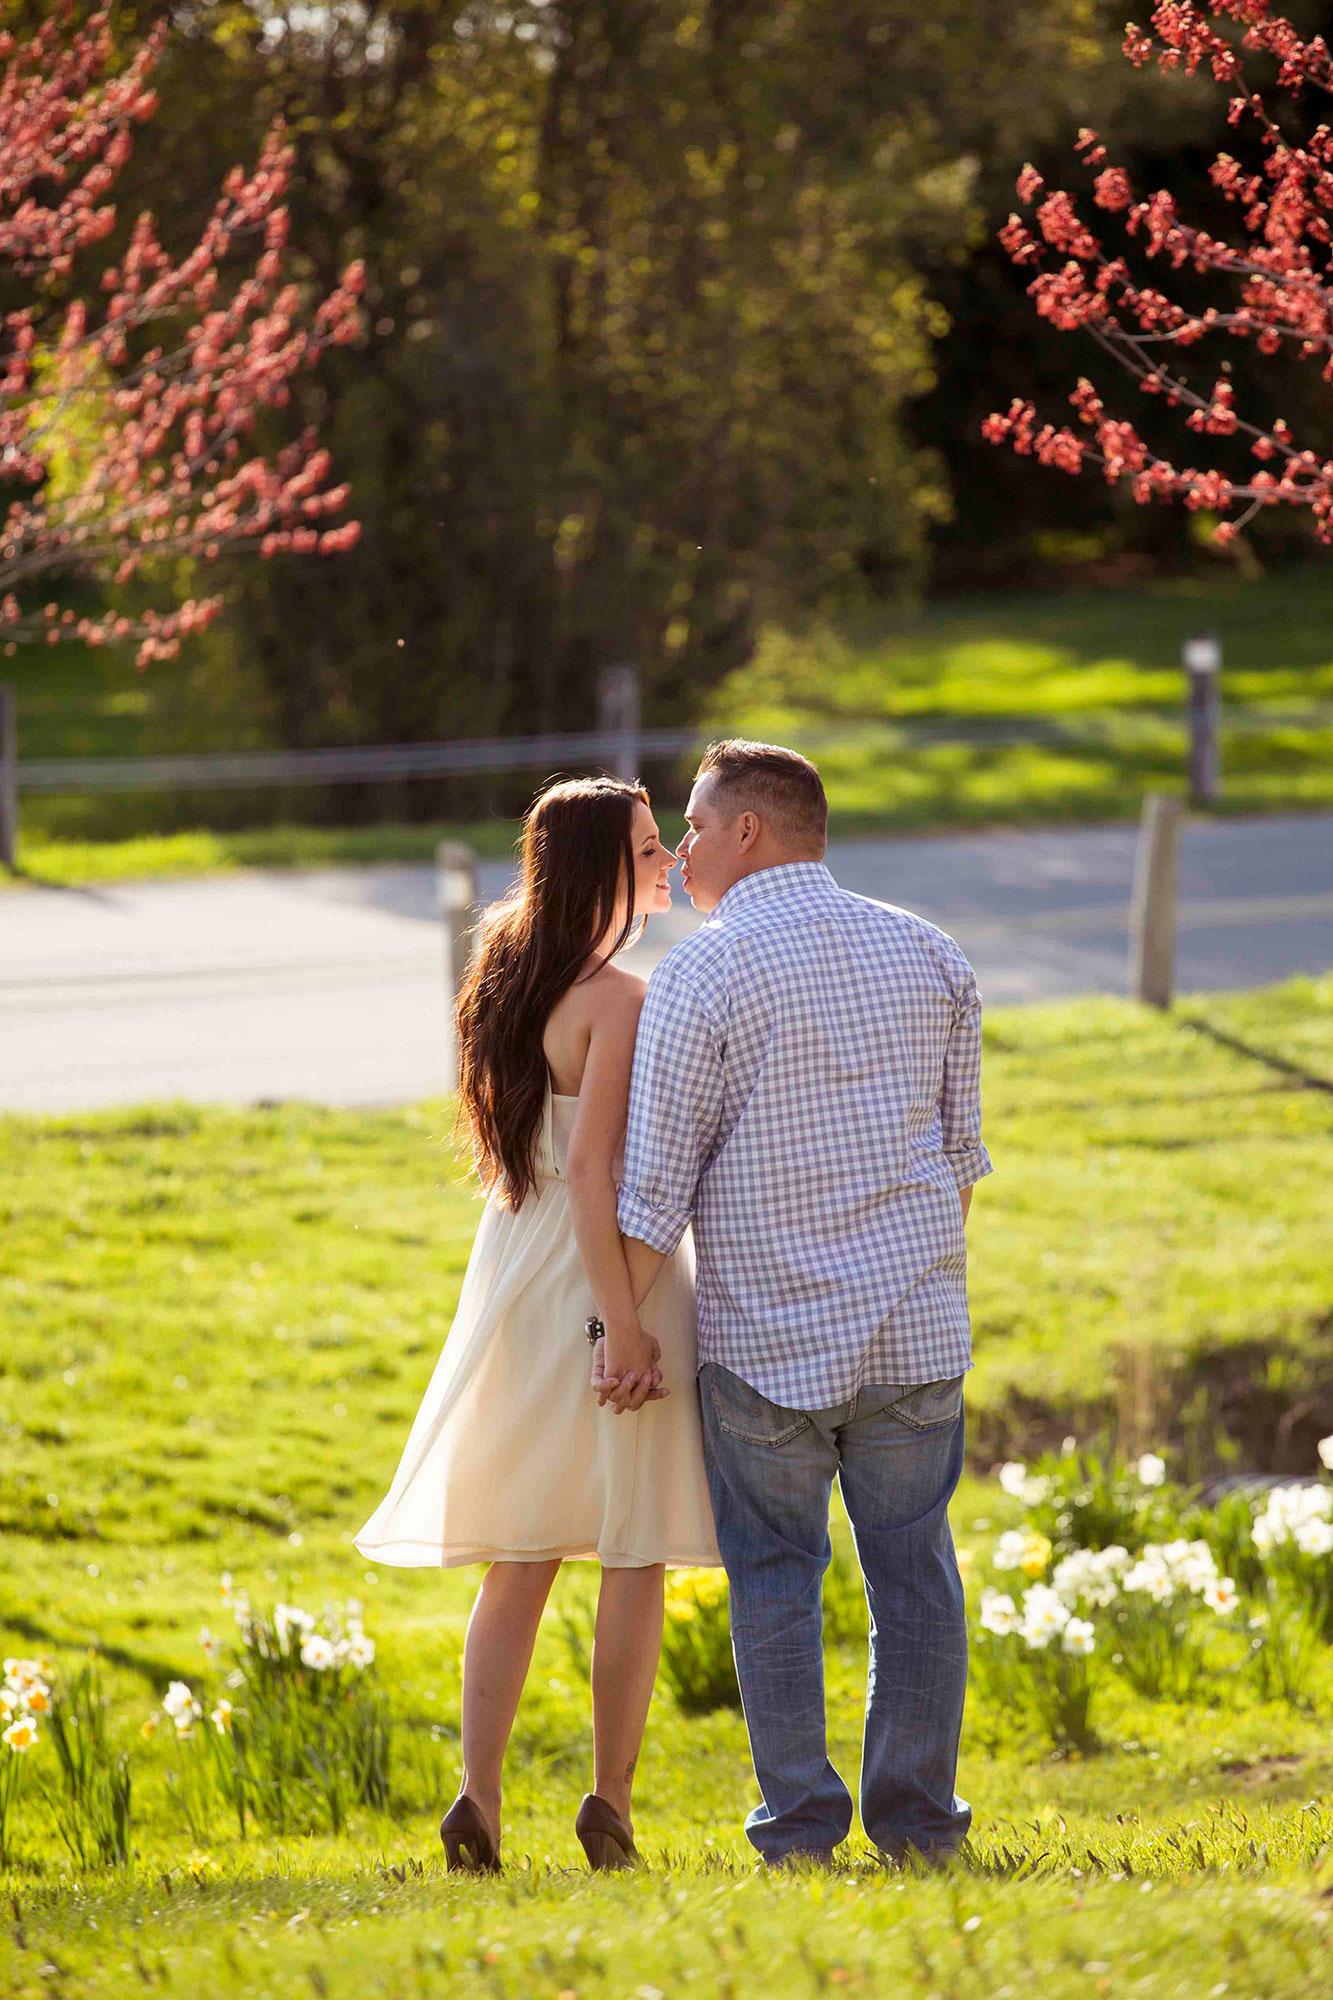 Niagara-on-the-Lake-Engagement-Vineyard-Bride-Photo-By-Gemini-Photography-025.jpg